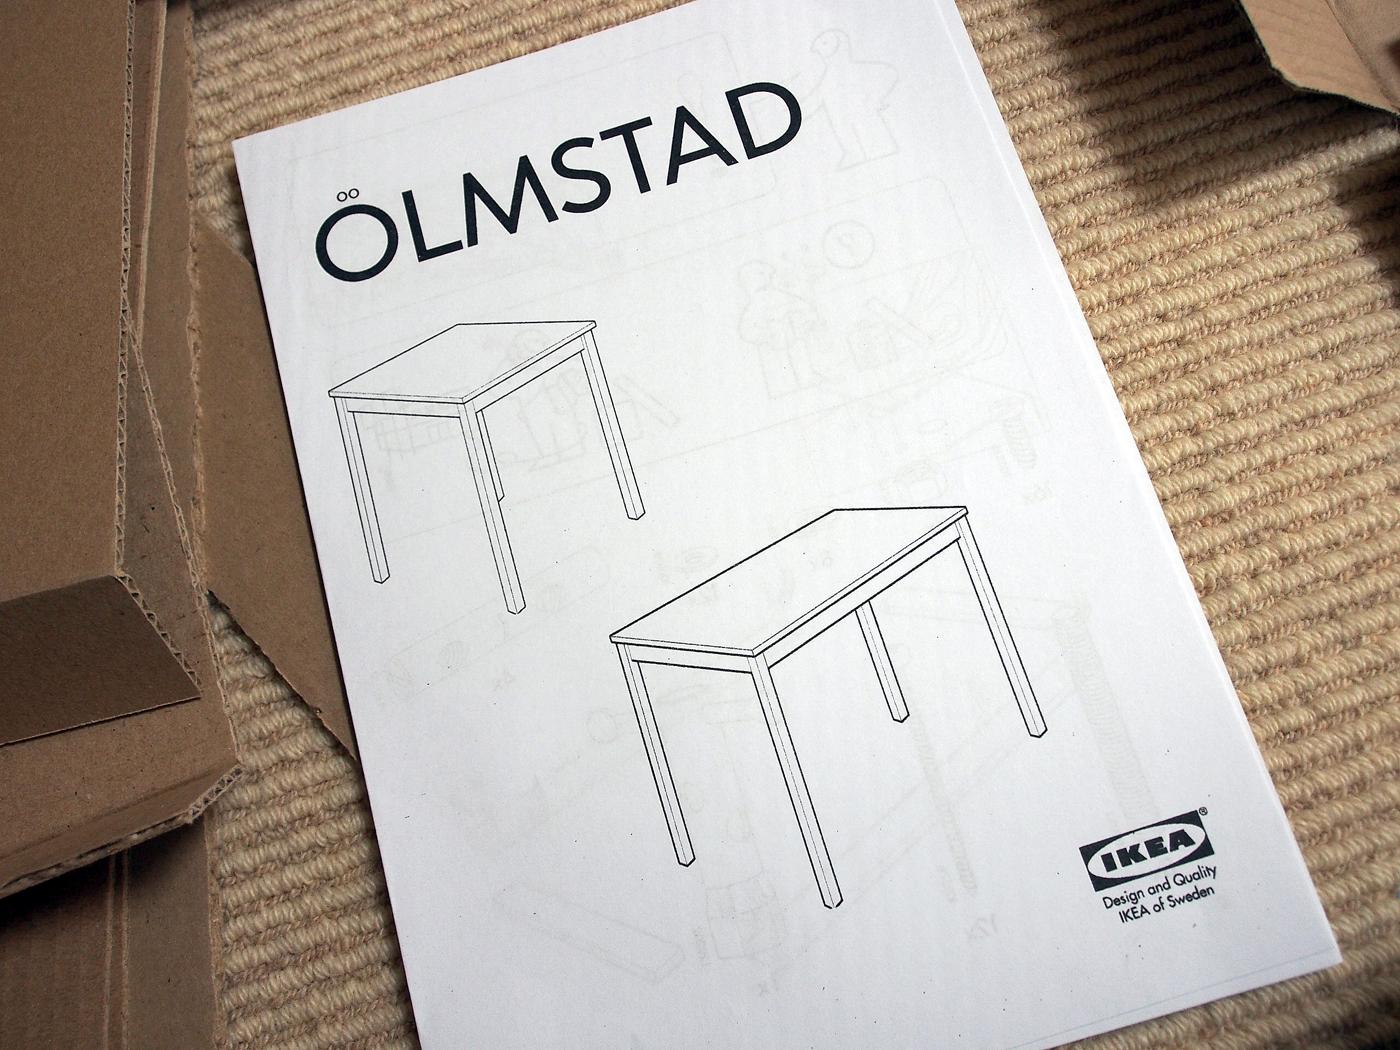 ÖLMSTAD、テーブル、組み立て説明書